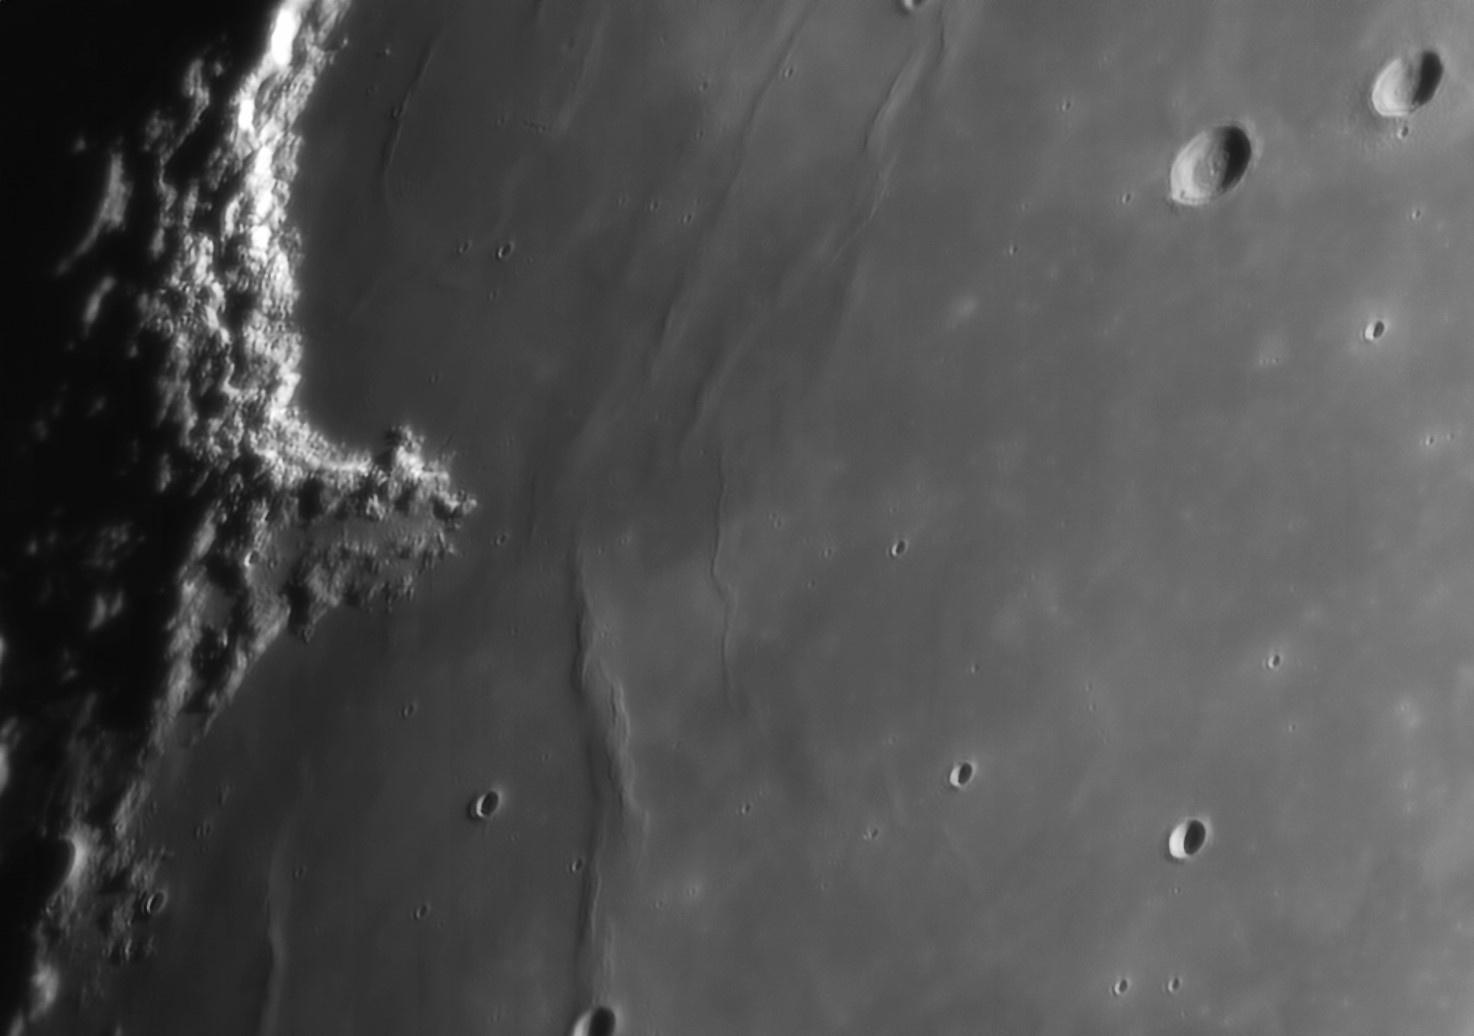 Helicon Promotorium Heraclides Łuna 17 Moon_211646_g2_ap335_conv pop.jpg